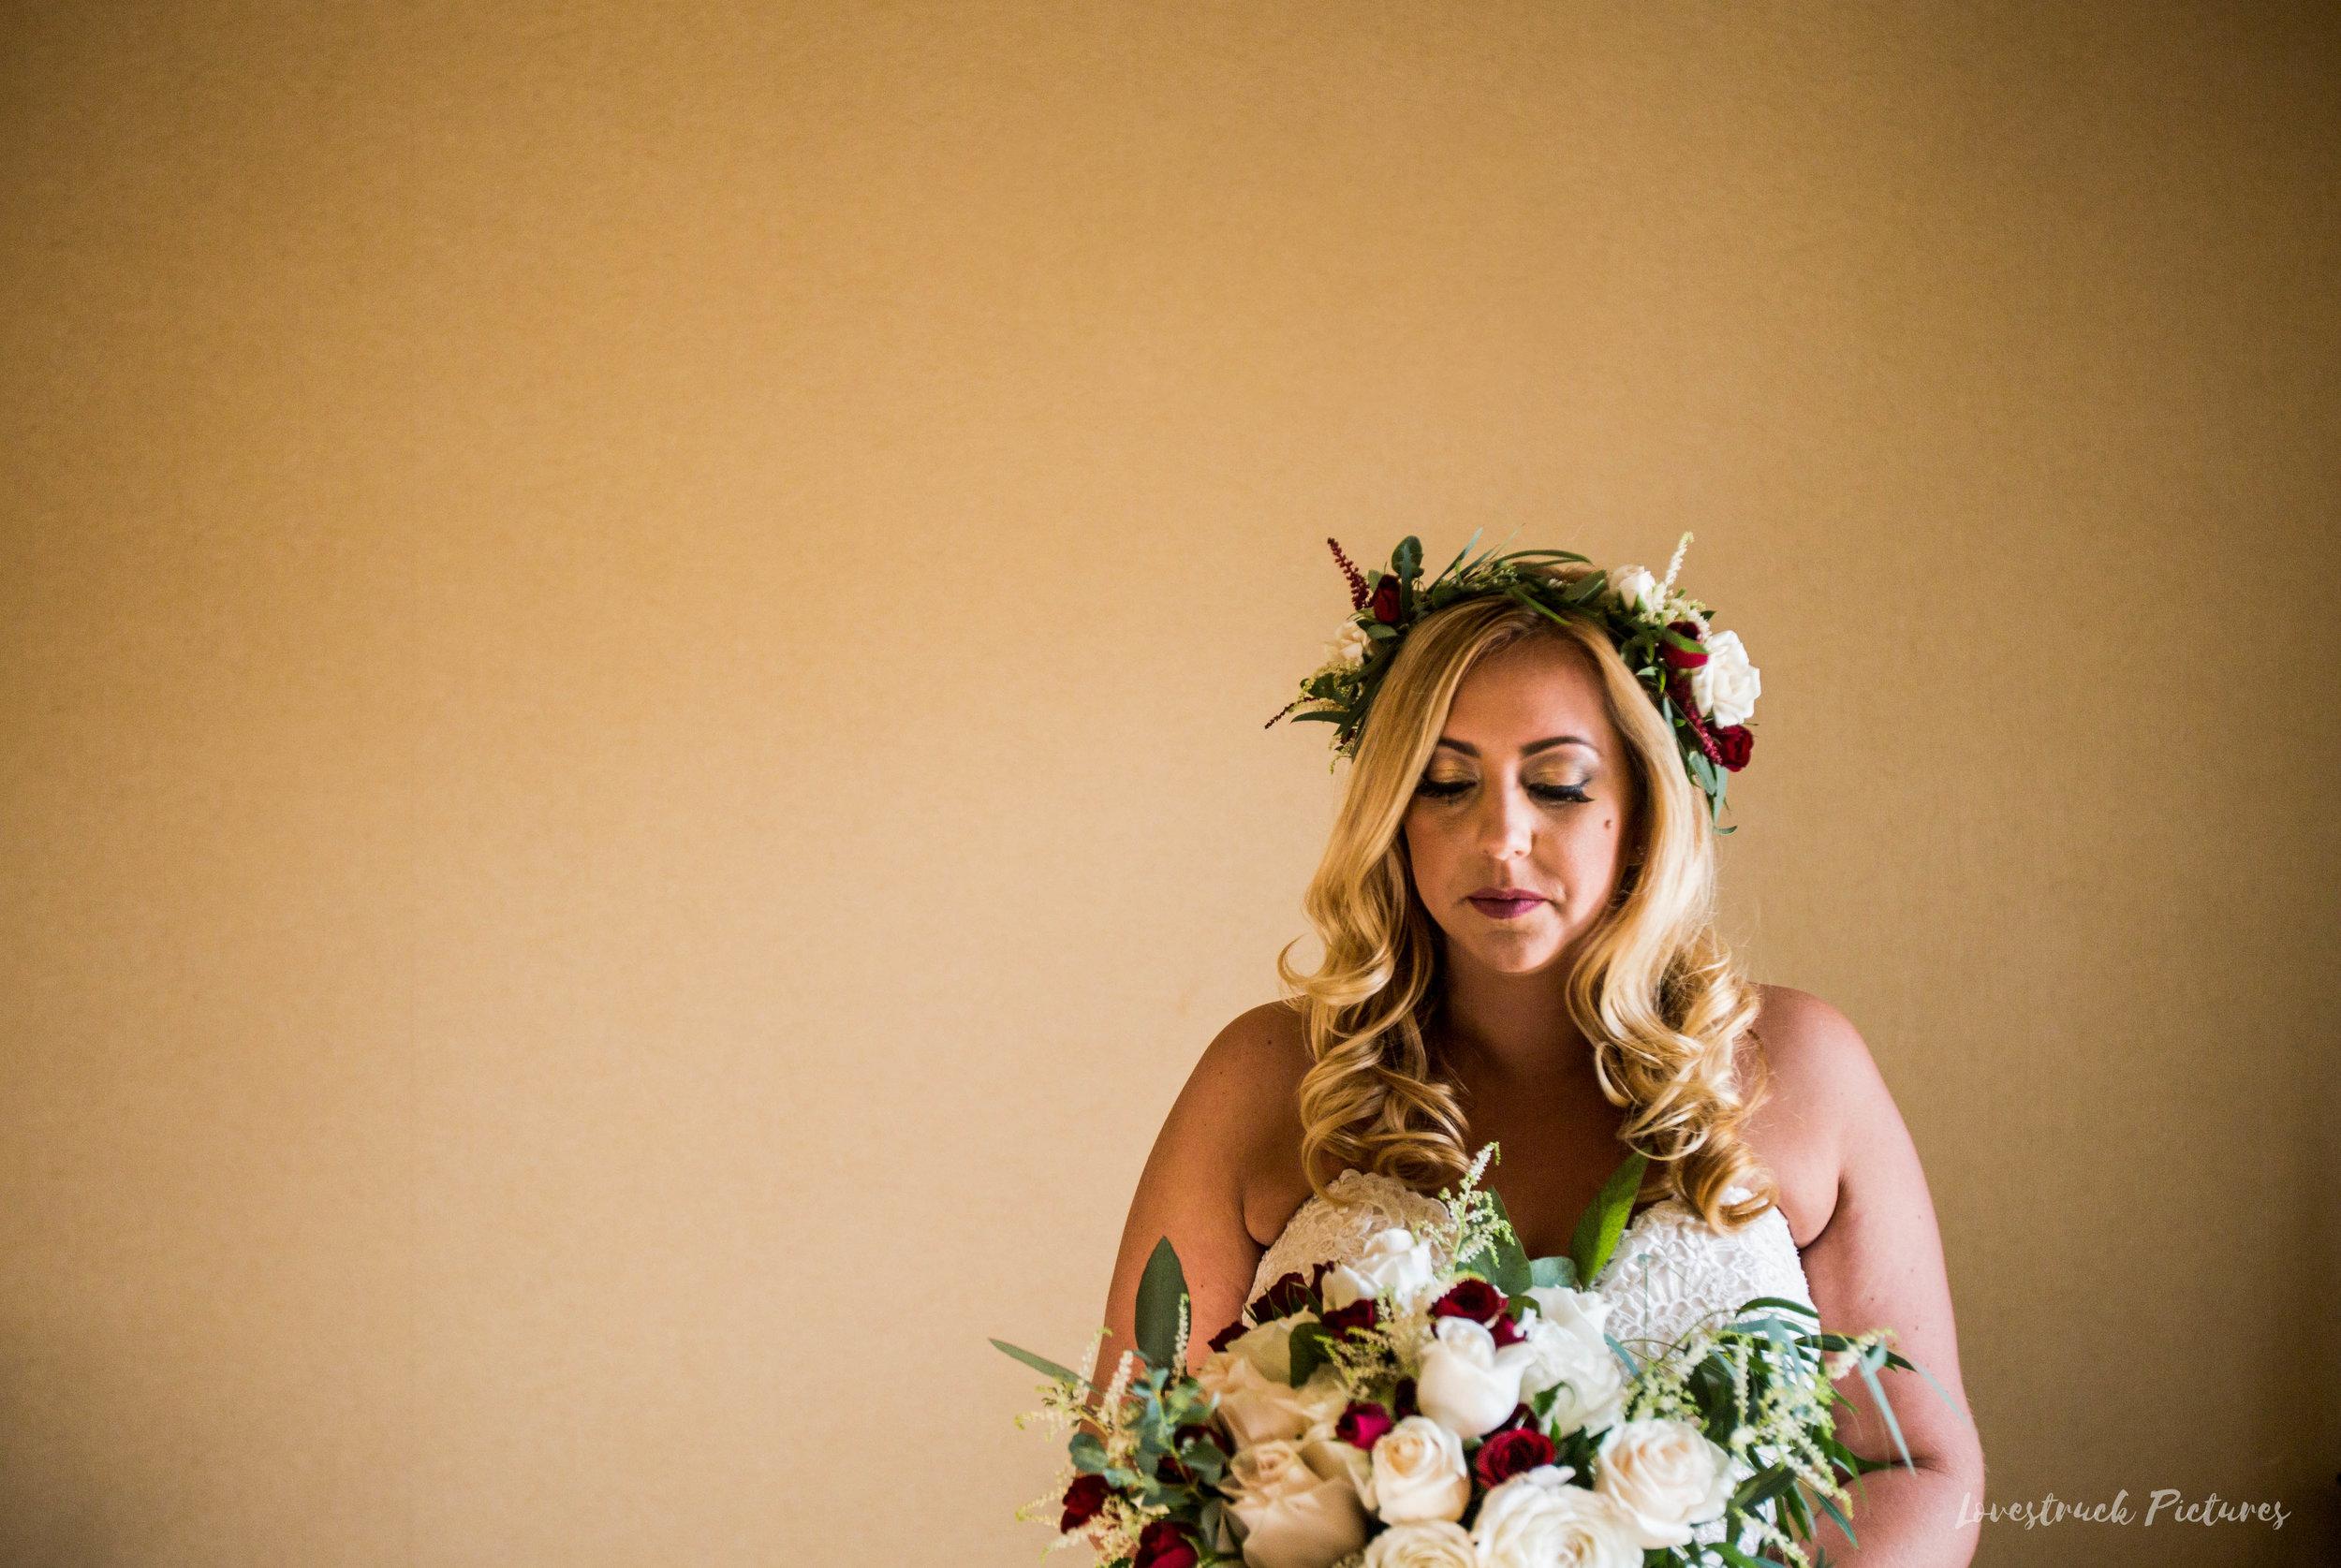 NORMANDY_FARMS_WEDDING_BLUEBELL_PA--18.jpg